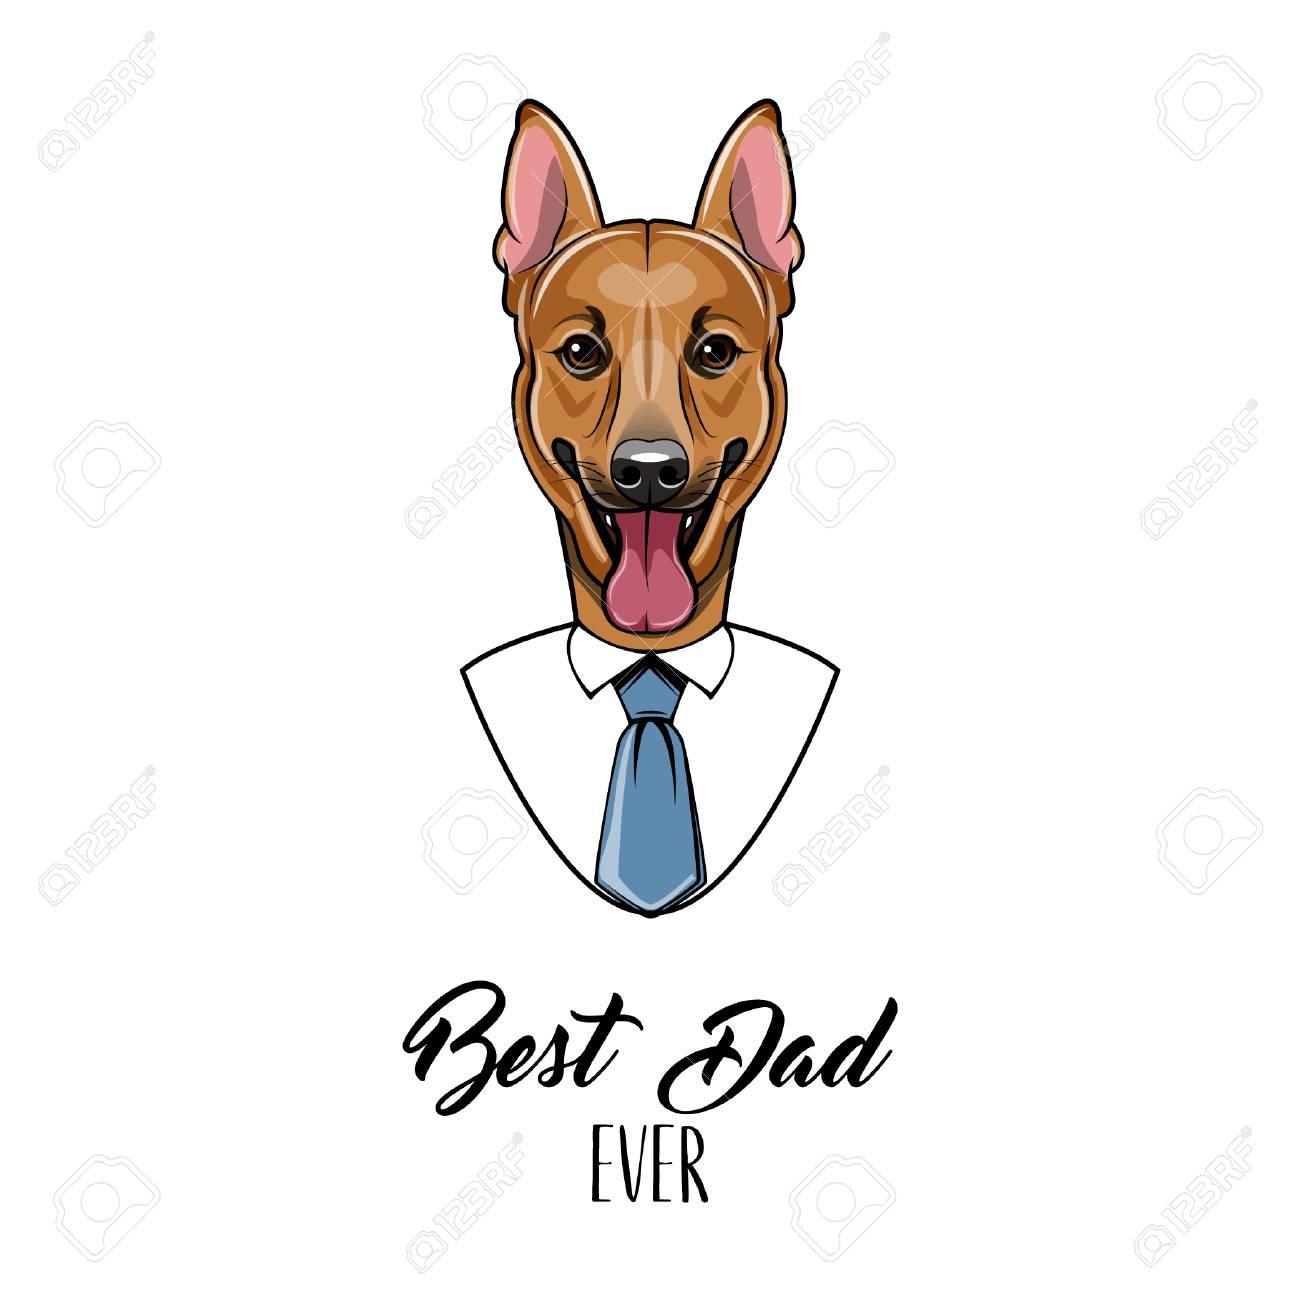 German shepherd dad fathers day greeting card best dad ever german shepherd dad fathers day greeting card best dad ever lettering with mens shirt m4hsunfo